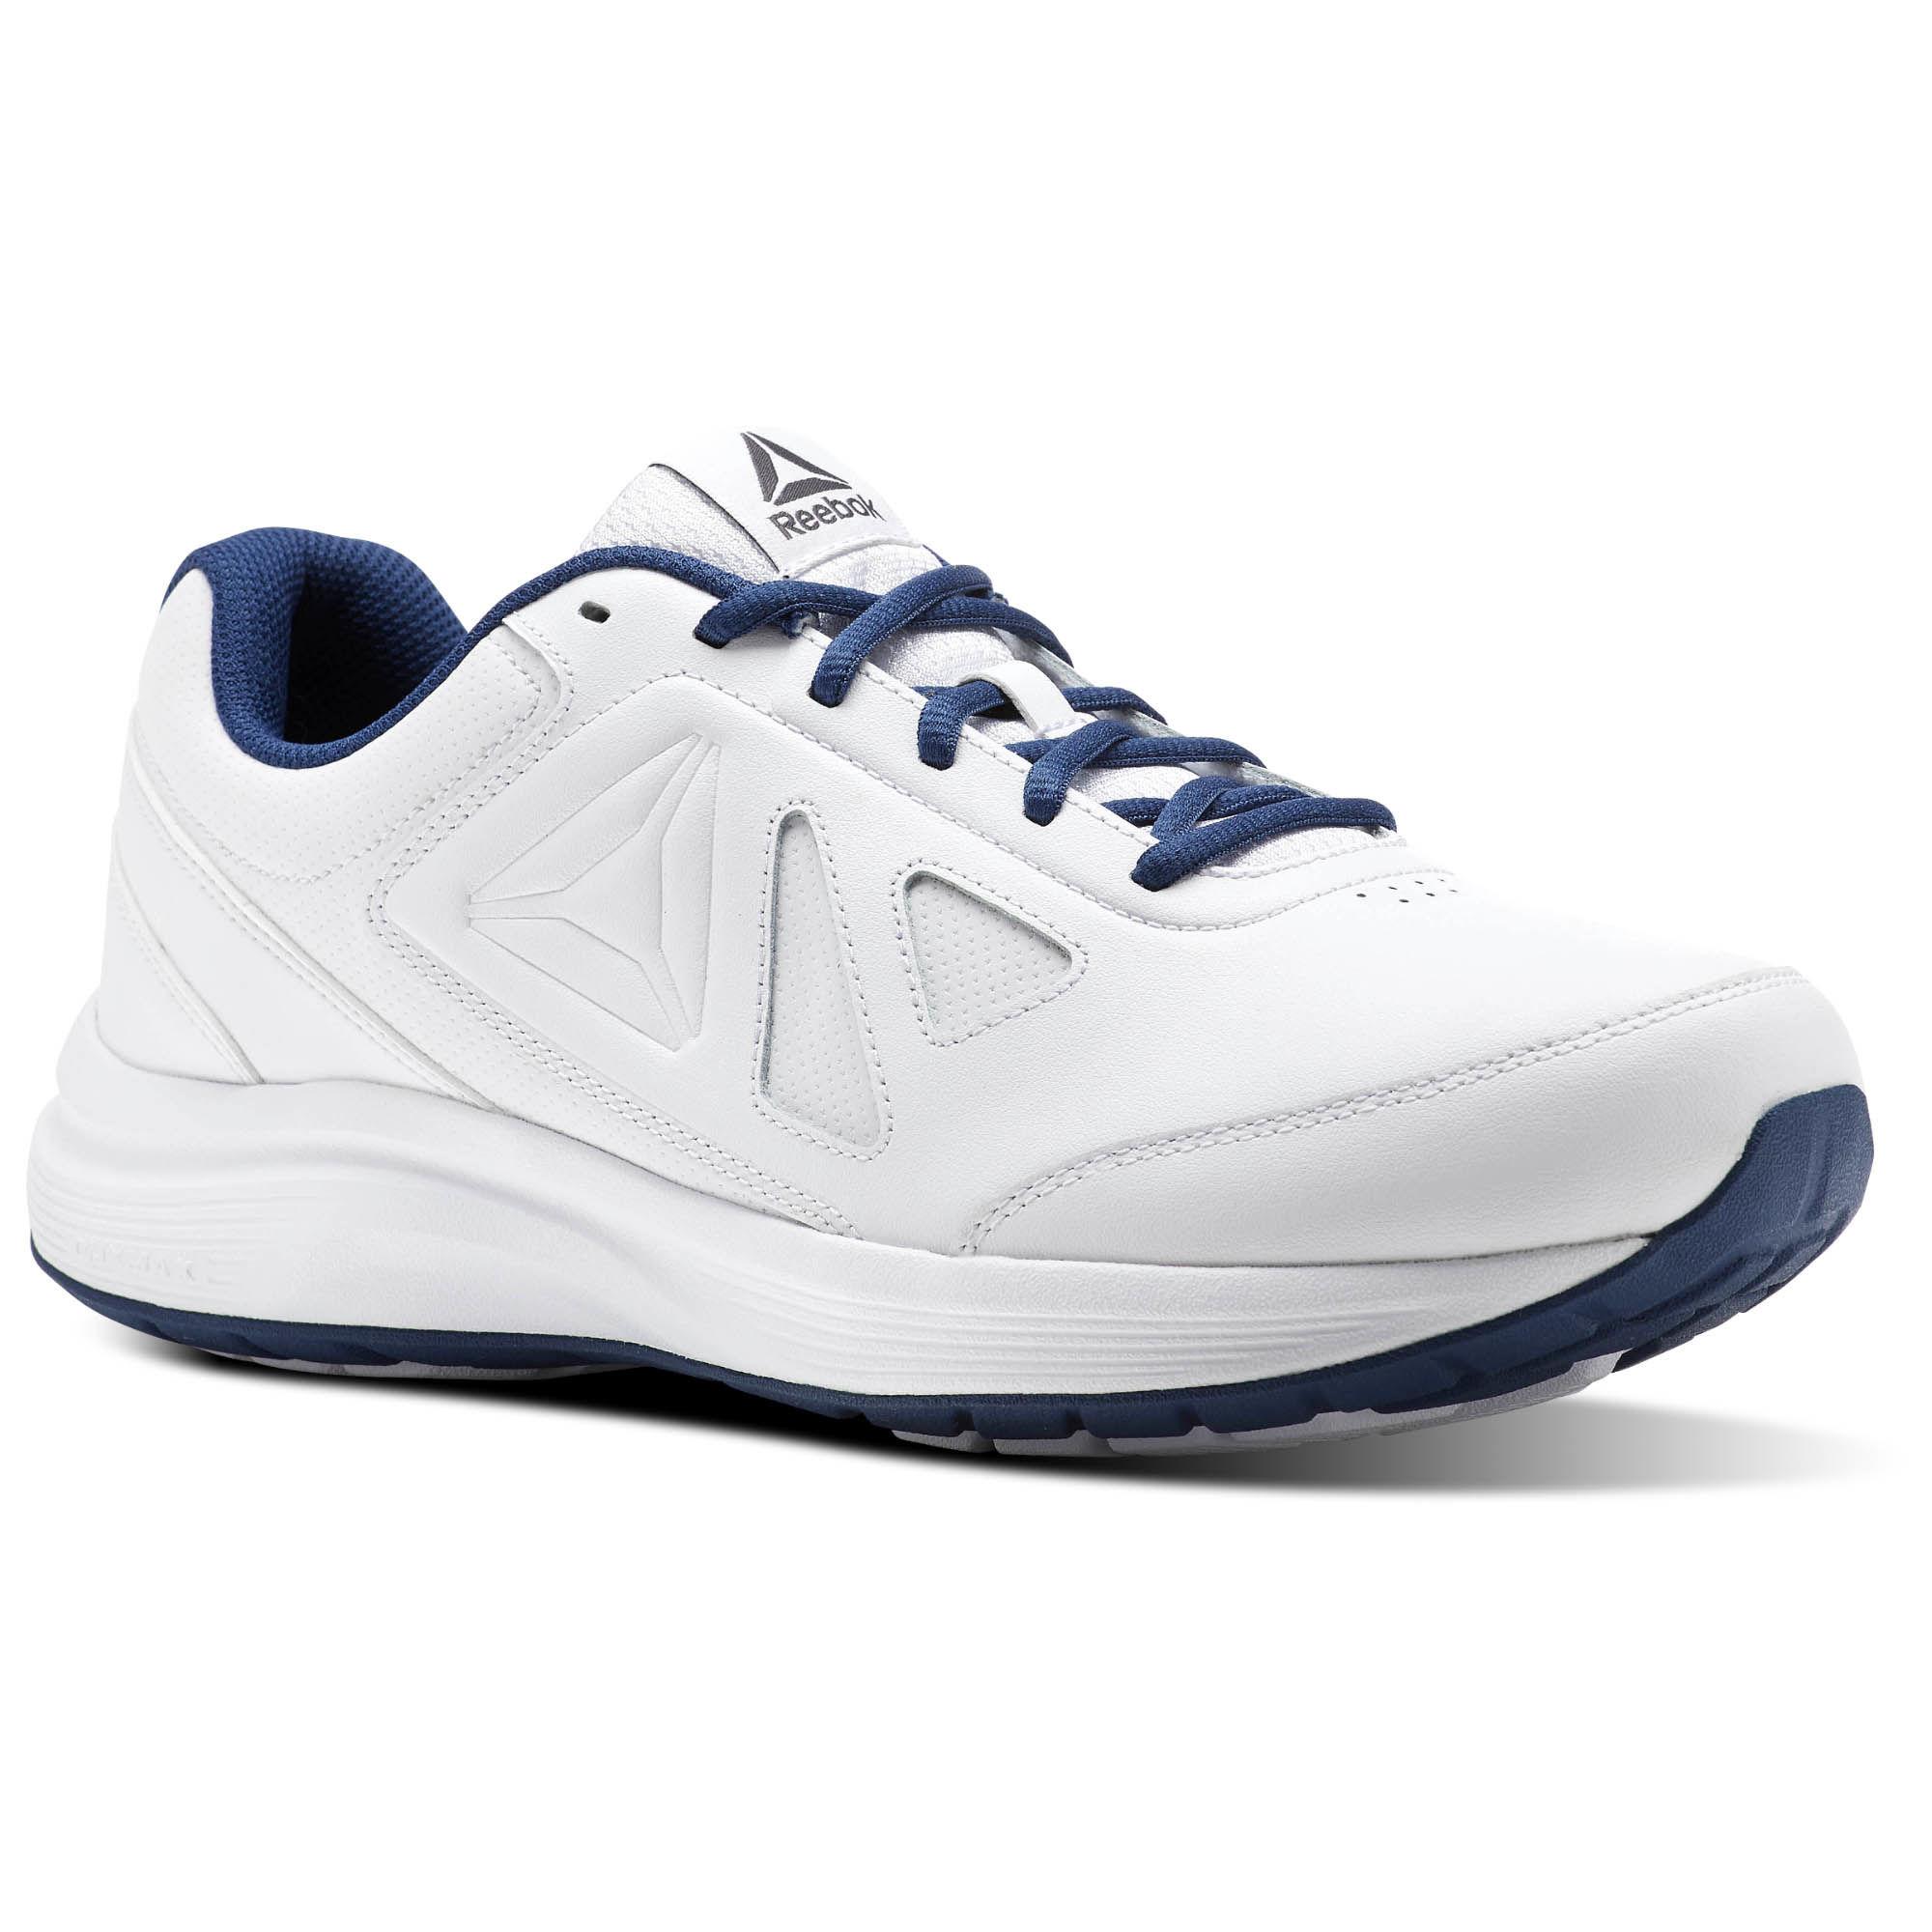 6565b85f304a Reebok Men s   Women s Ultra 6 DMX Max Walking Shoes - Slickdeals.net